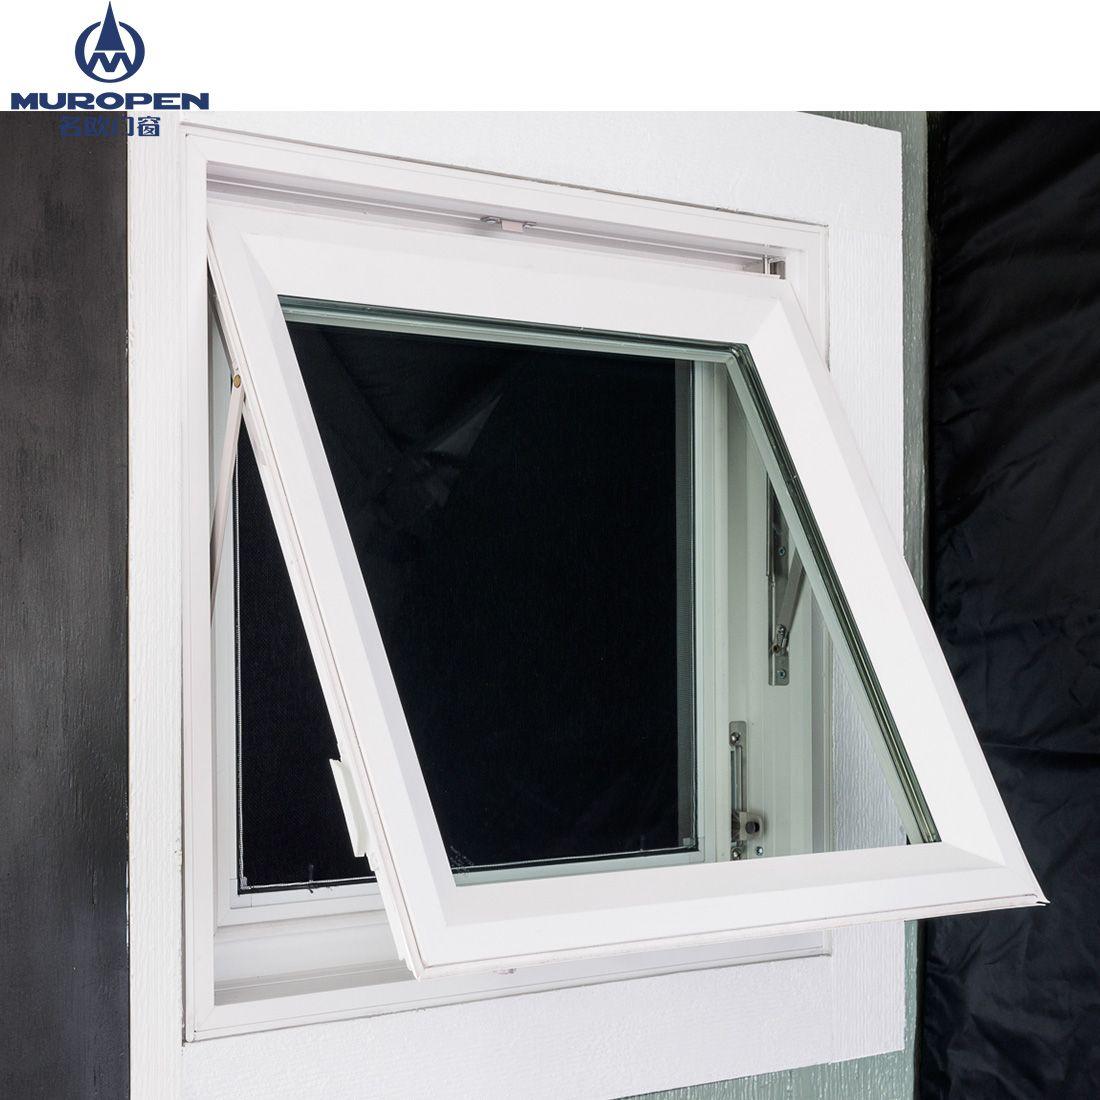 Aluminum Casement Windows Wood Clad Aluminum Windows Swing Casement Hinged Windows Awning Windows Tilt And Casement Windows Vinyl Casement Windows Casement